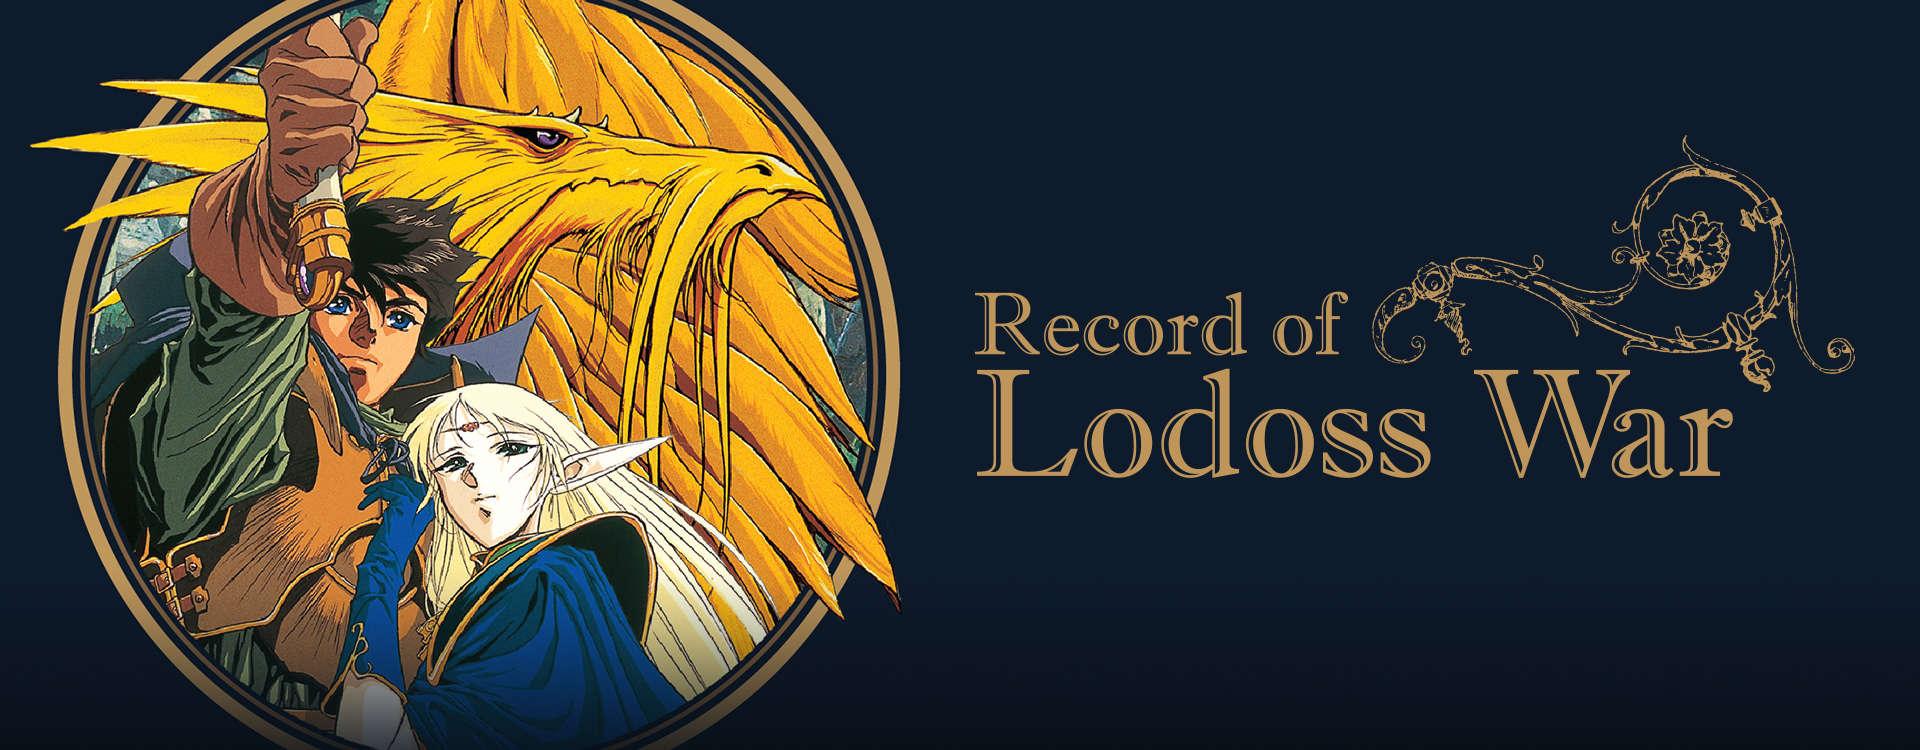 Record Of Lodoss War Stream